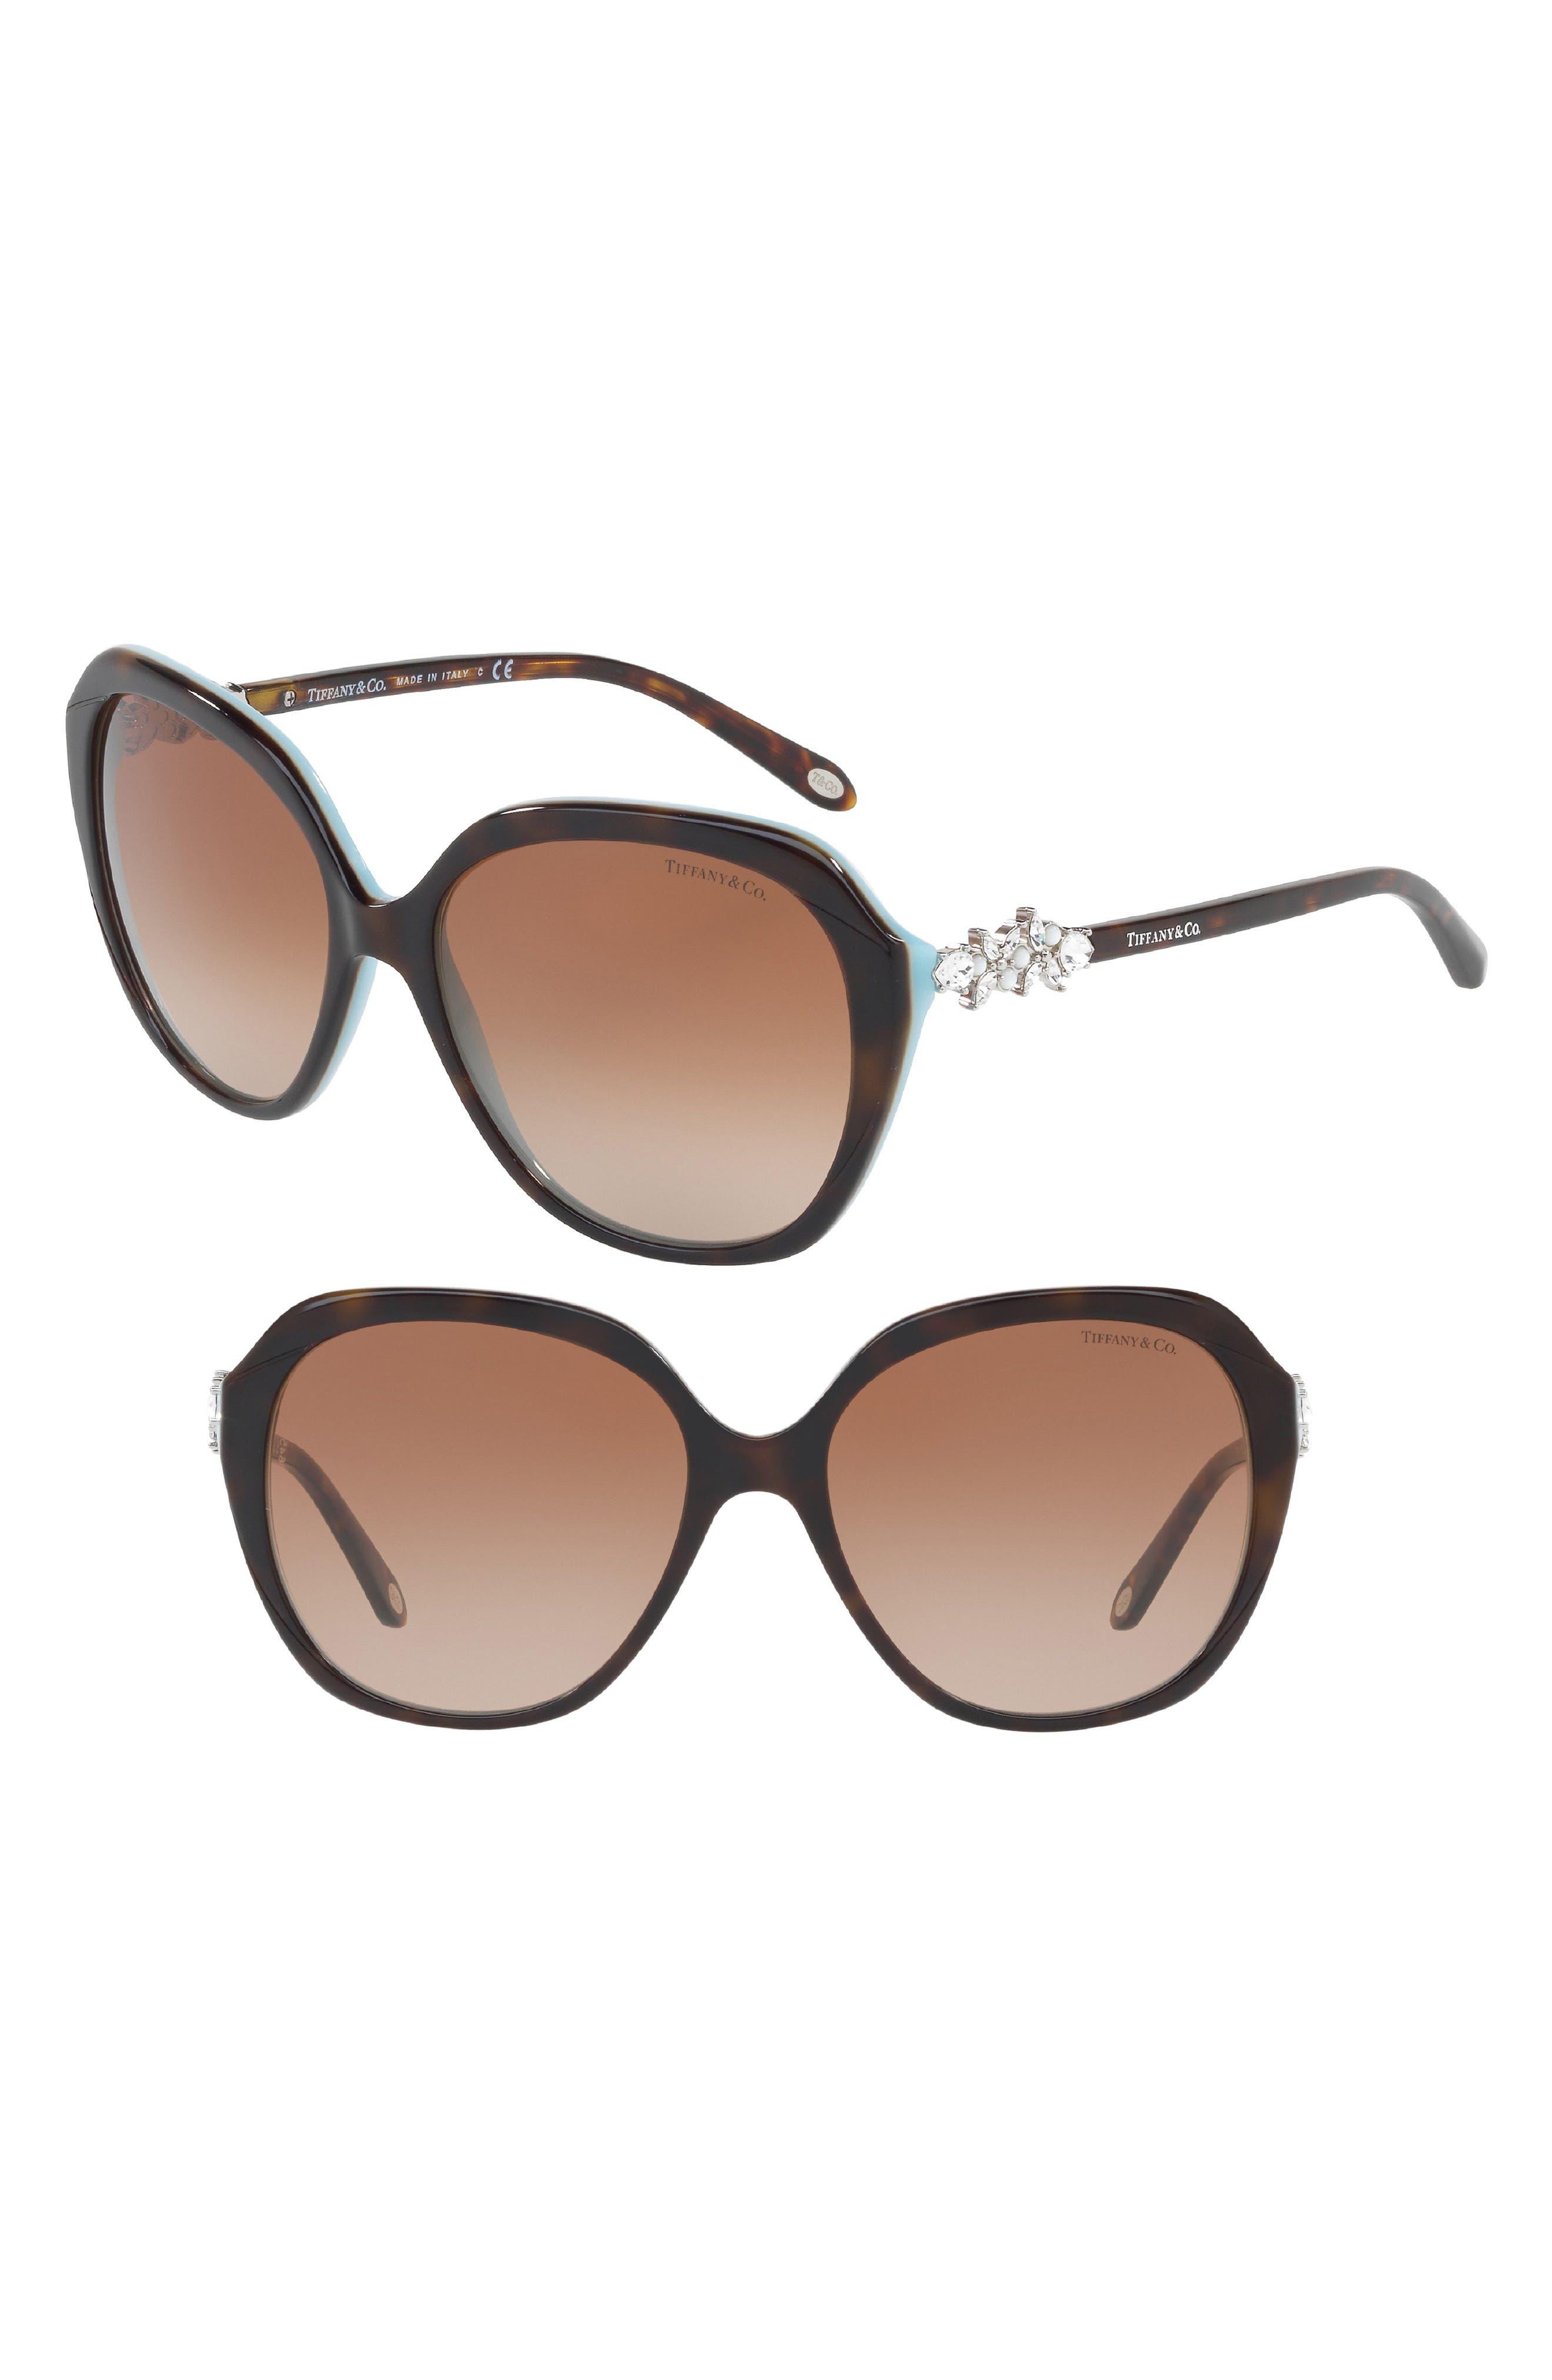 Tiffany 57mm Sunglasses,                             Main thumbnail 1, color,                             Havana/ Blue Gradient